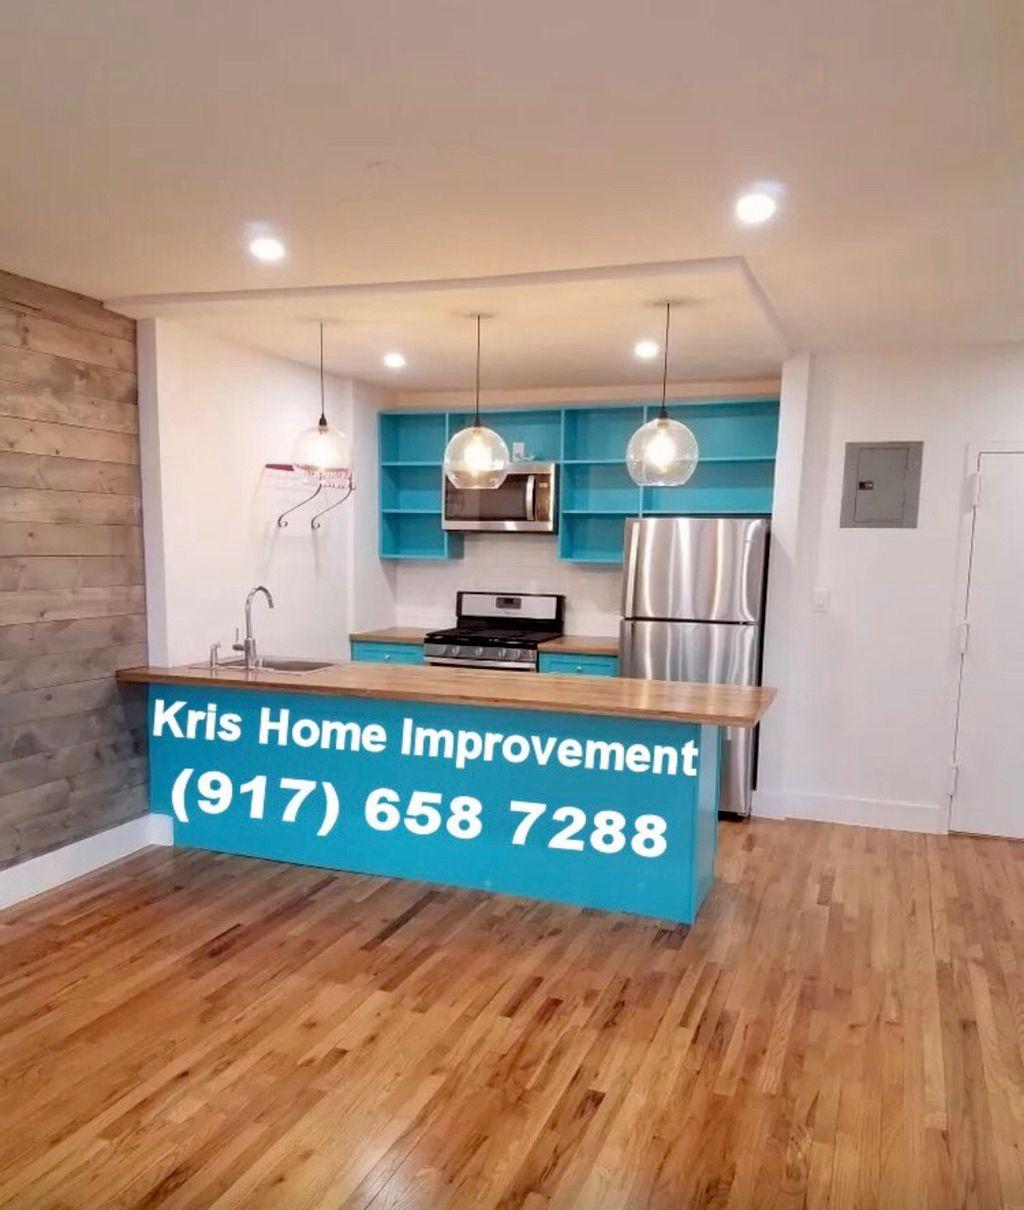 KRIS HOME IMPROVEMENT